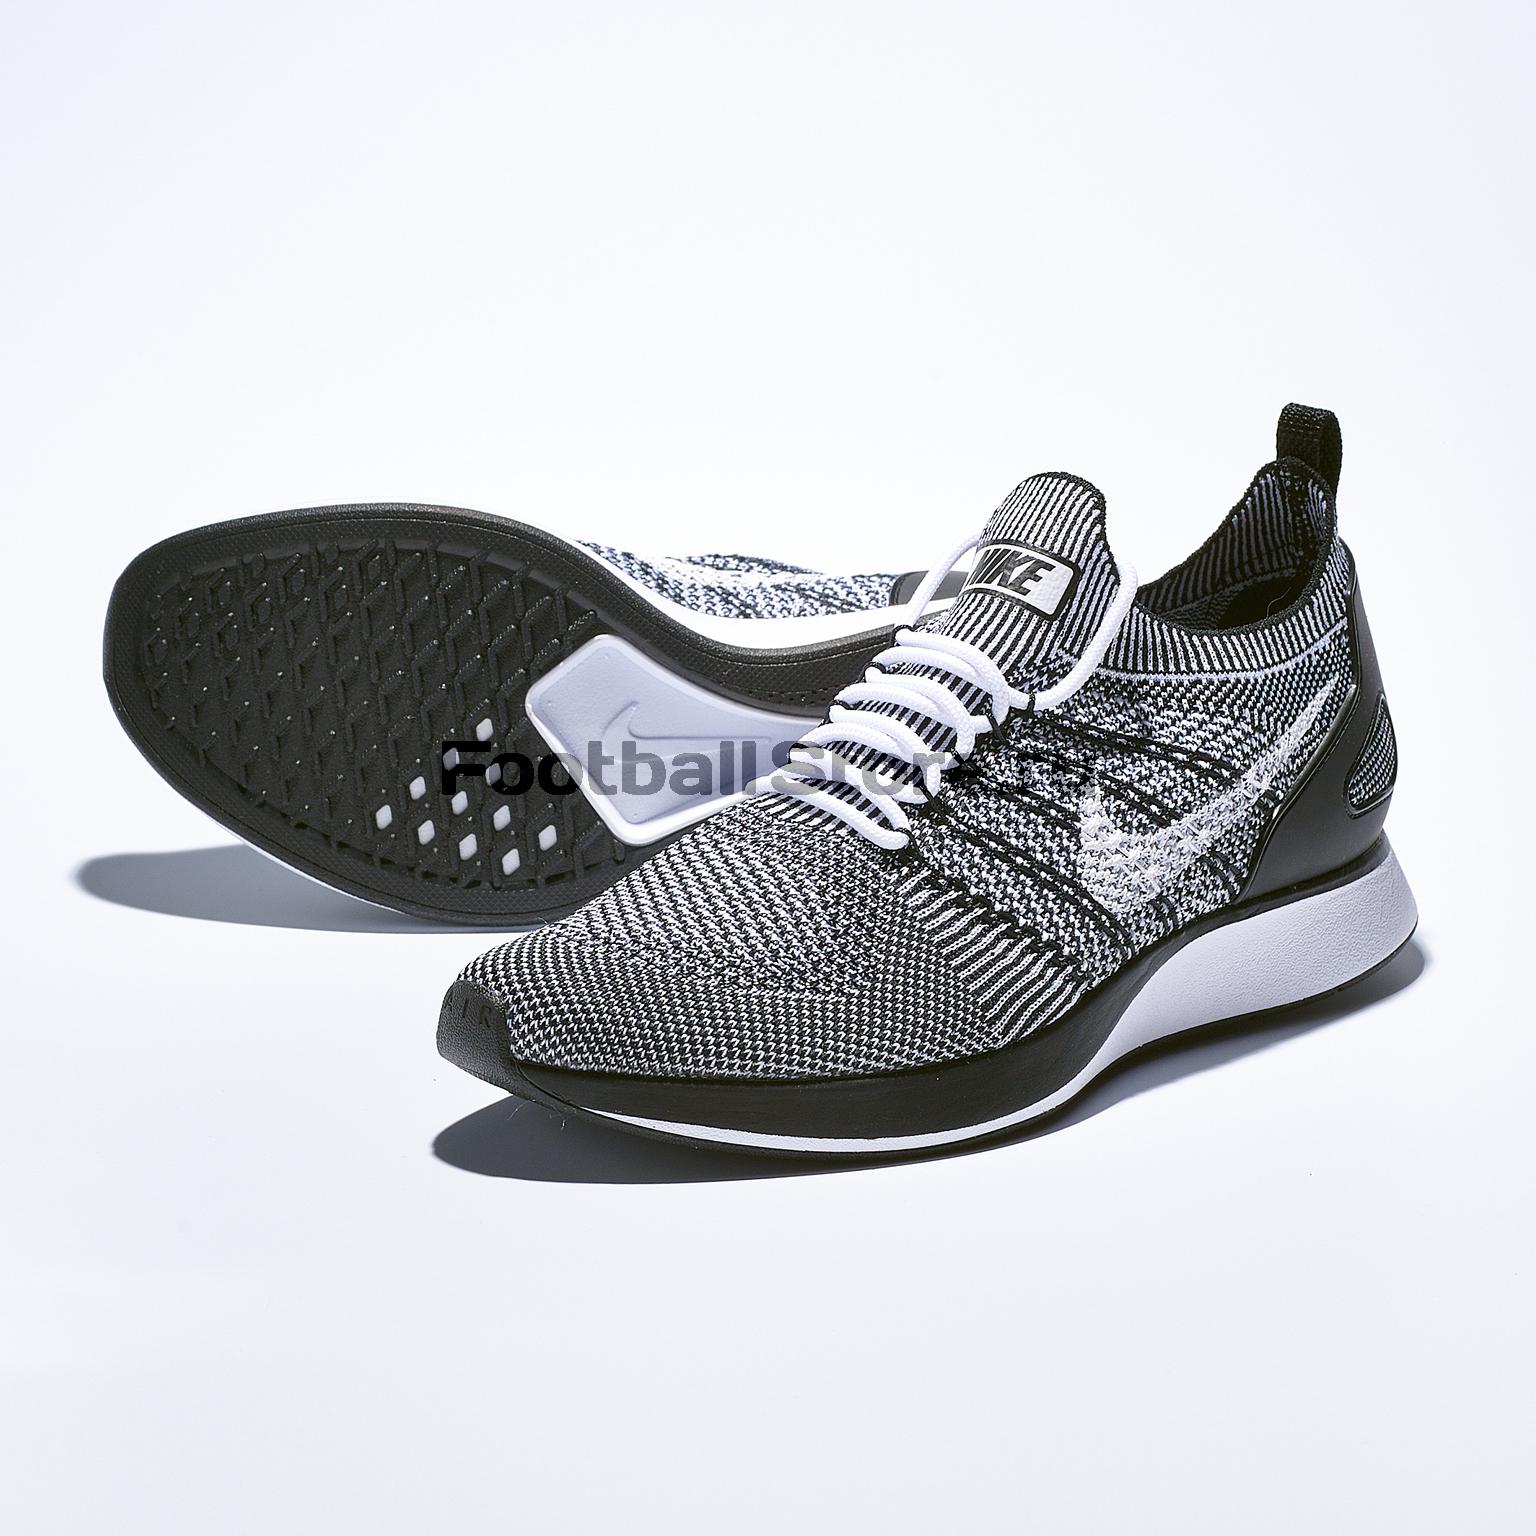 Кроссовки Nike Air Zoom Mariah Flyknit Racer 918264-102 – купить в ... b3bd9c35fe8